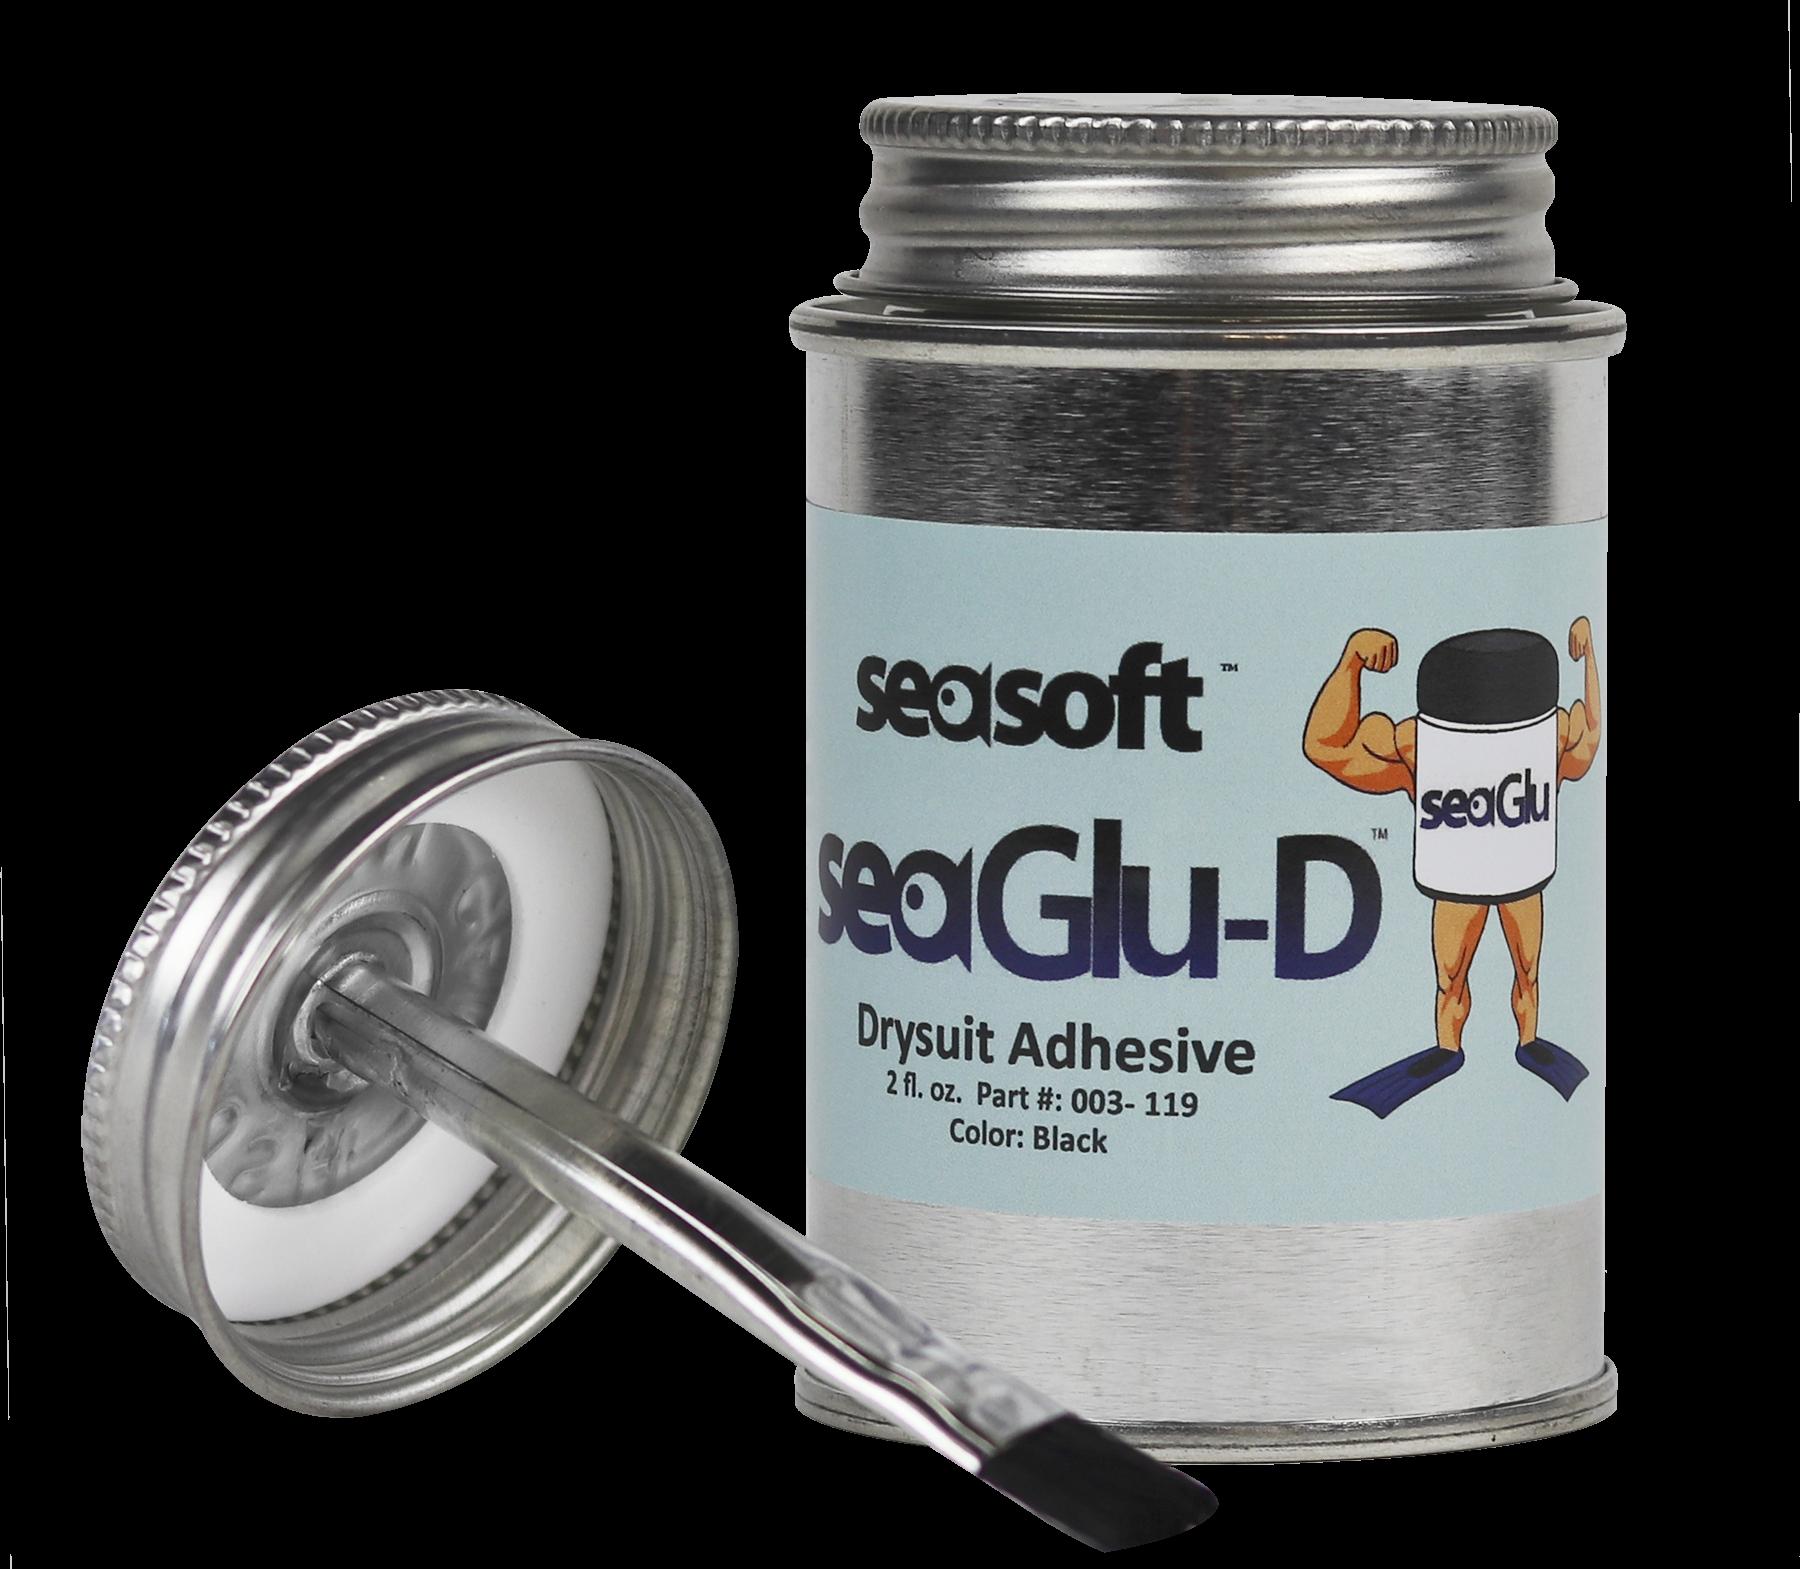 SEASOFT's SeaGLU-D™  2 oz. & 8 oz. Drysuit Adhesive